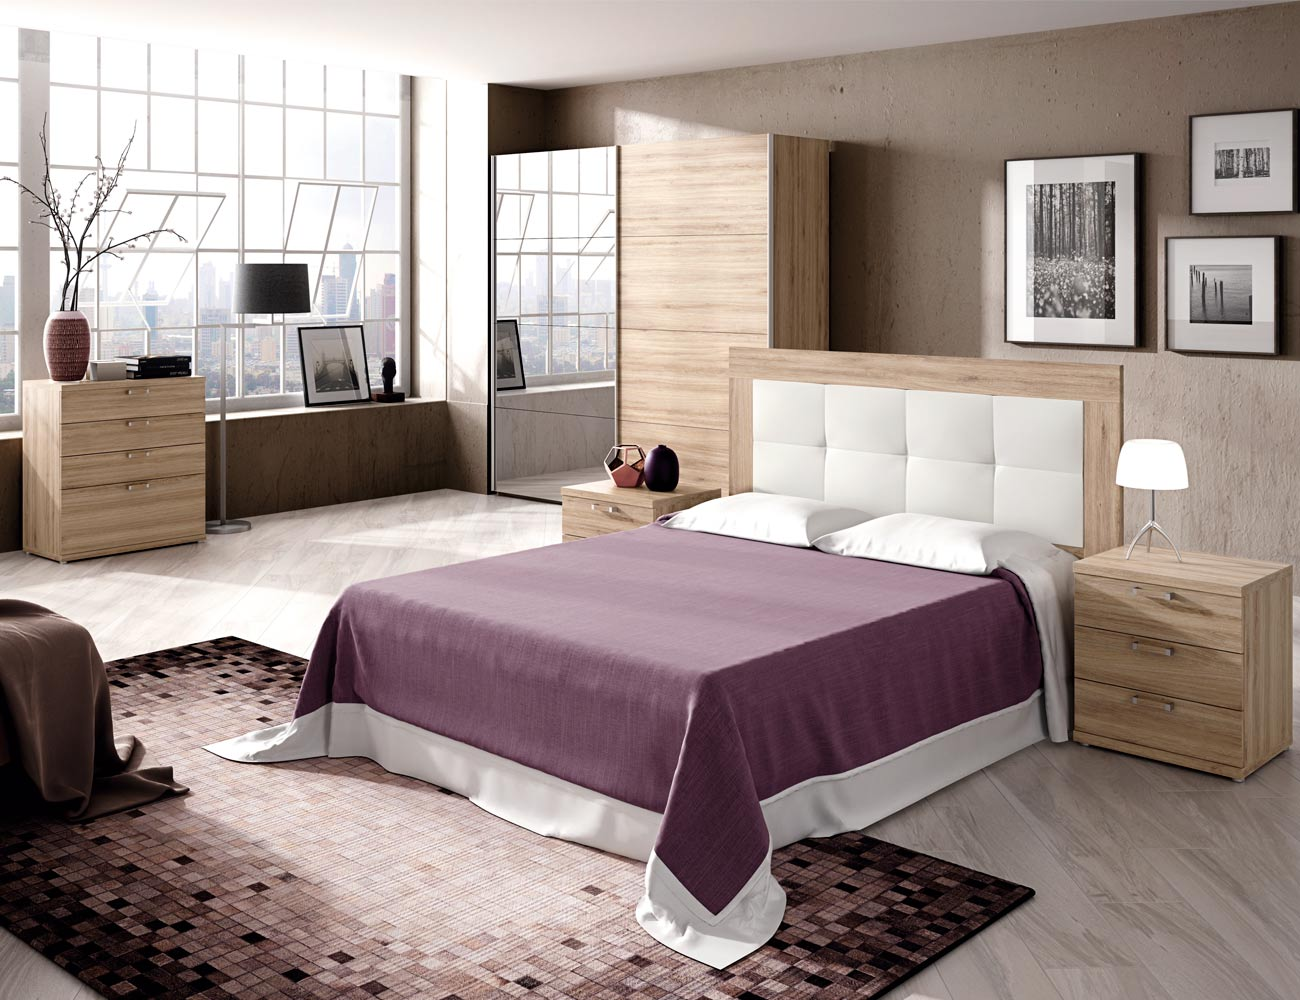 467 dormitorio matrimonio cabecero tapizado comoda armario roble1